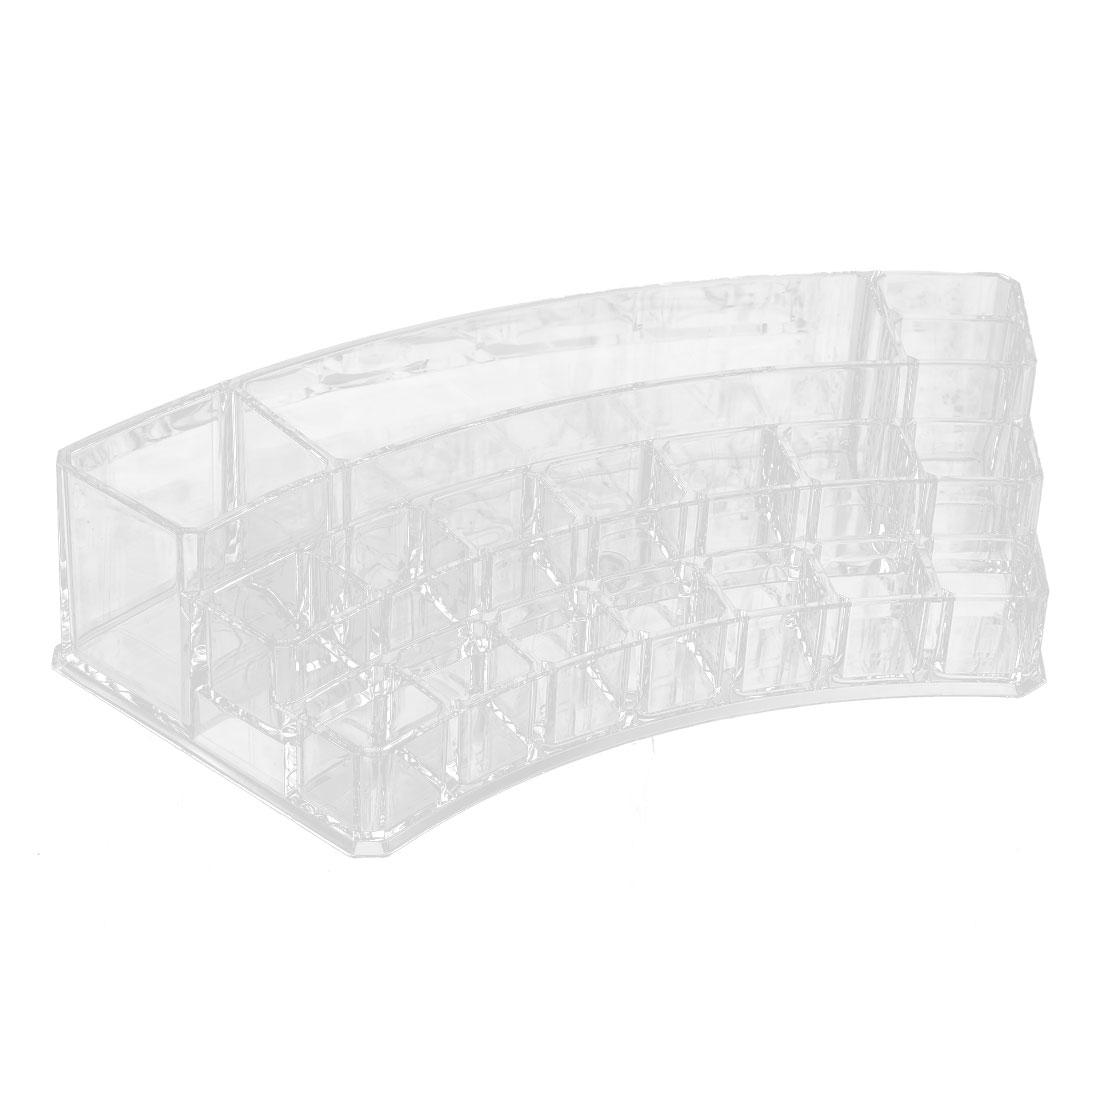 Acrylic Curved 18-slot Makeup Cosmetic Organizer Display Box